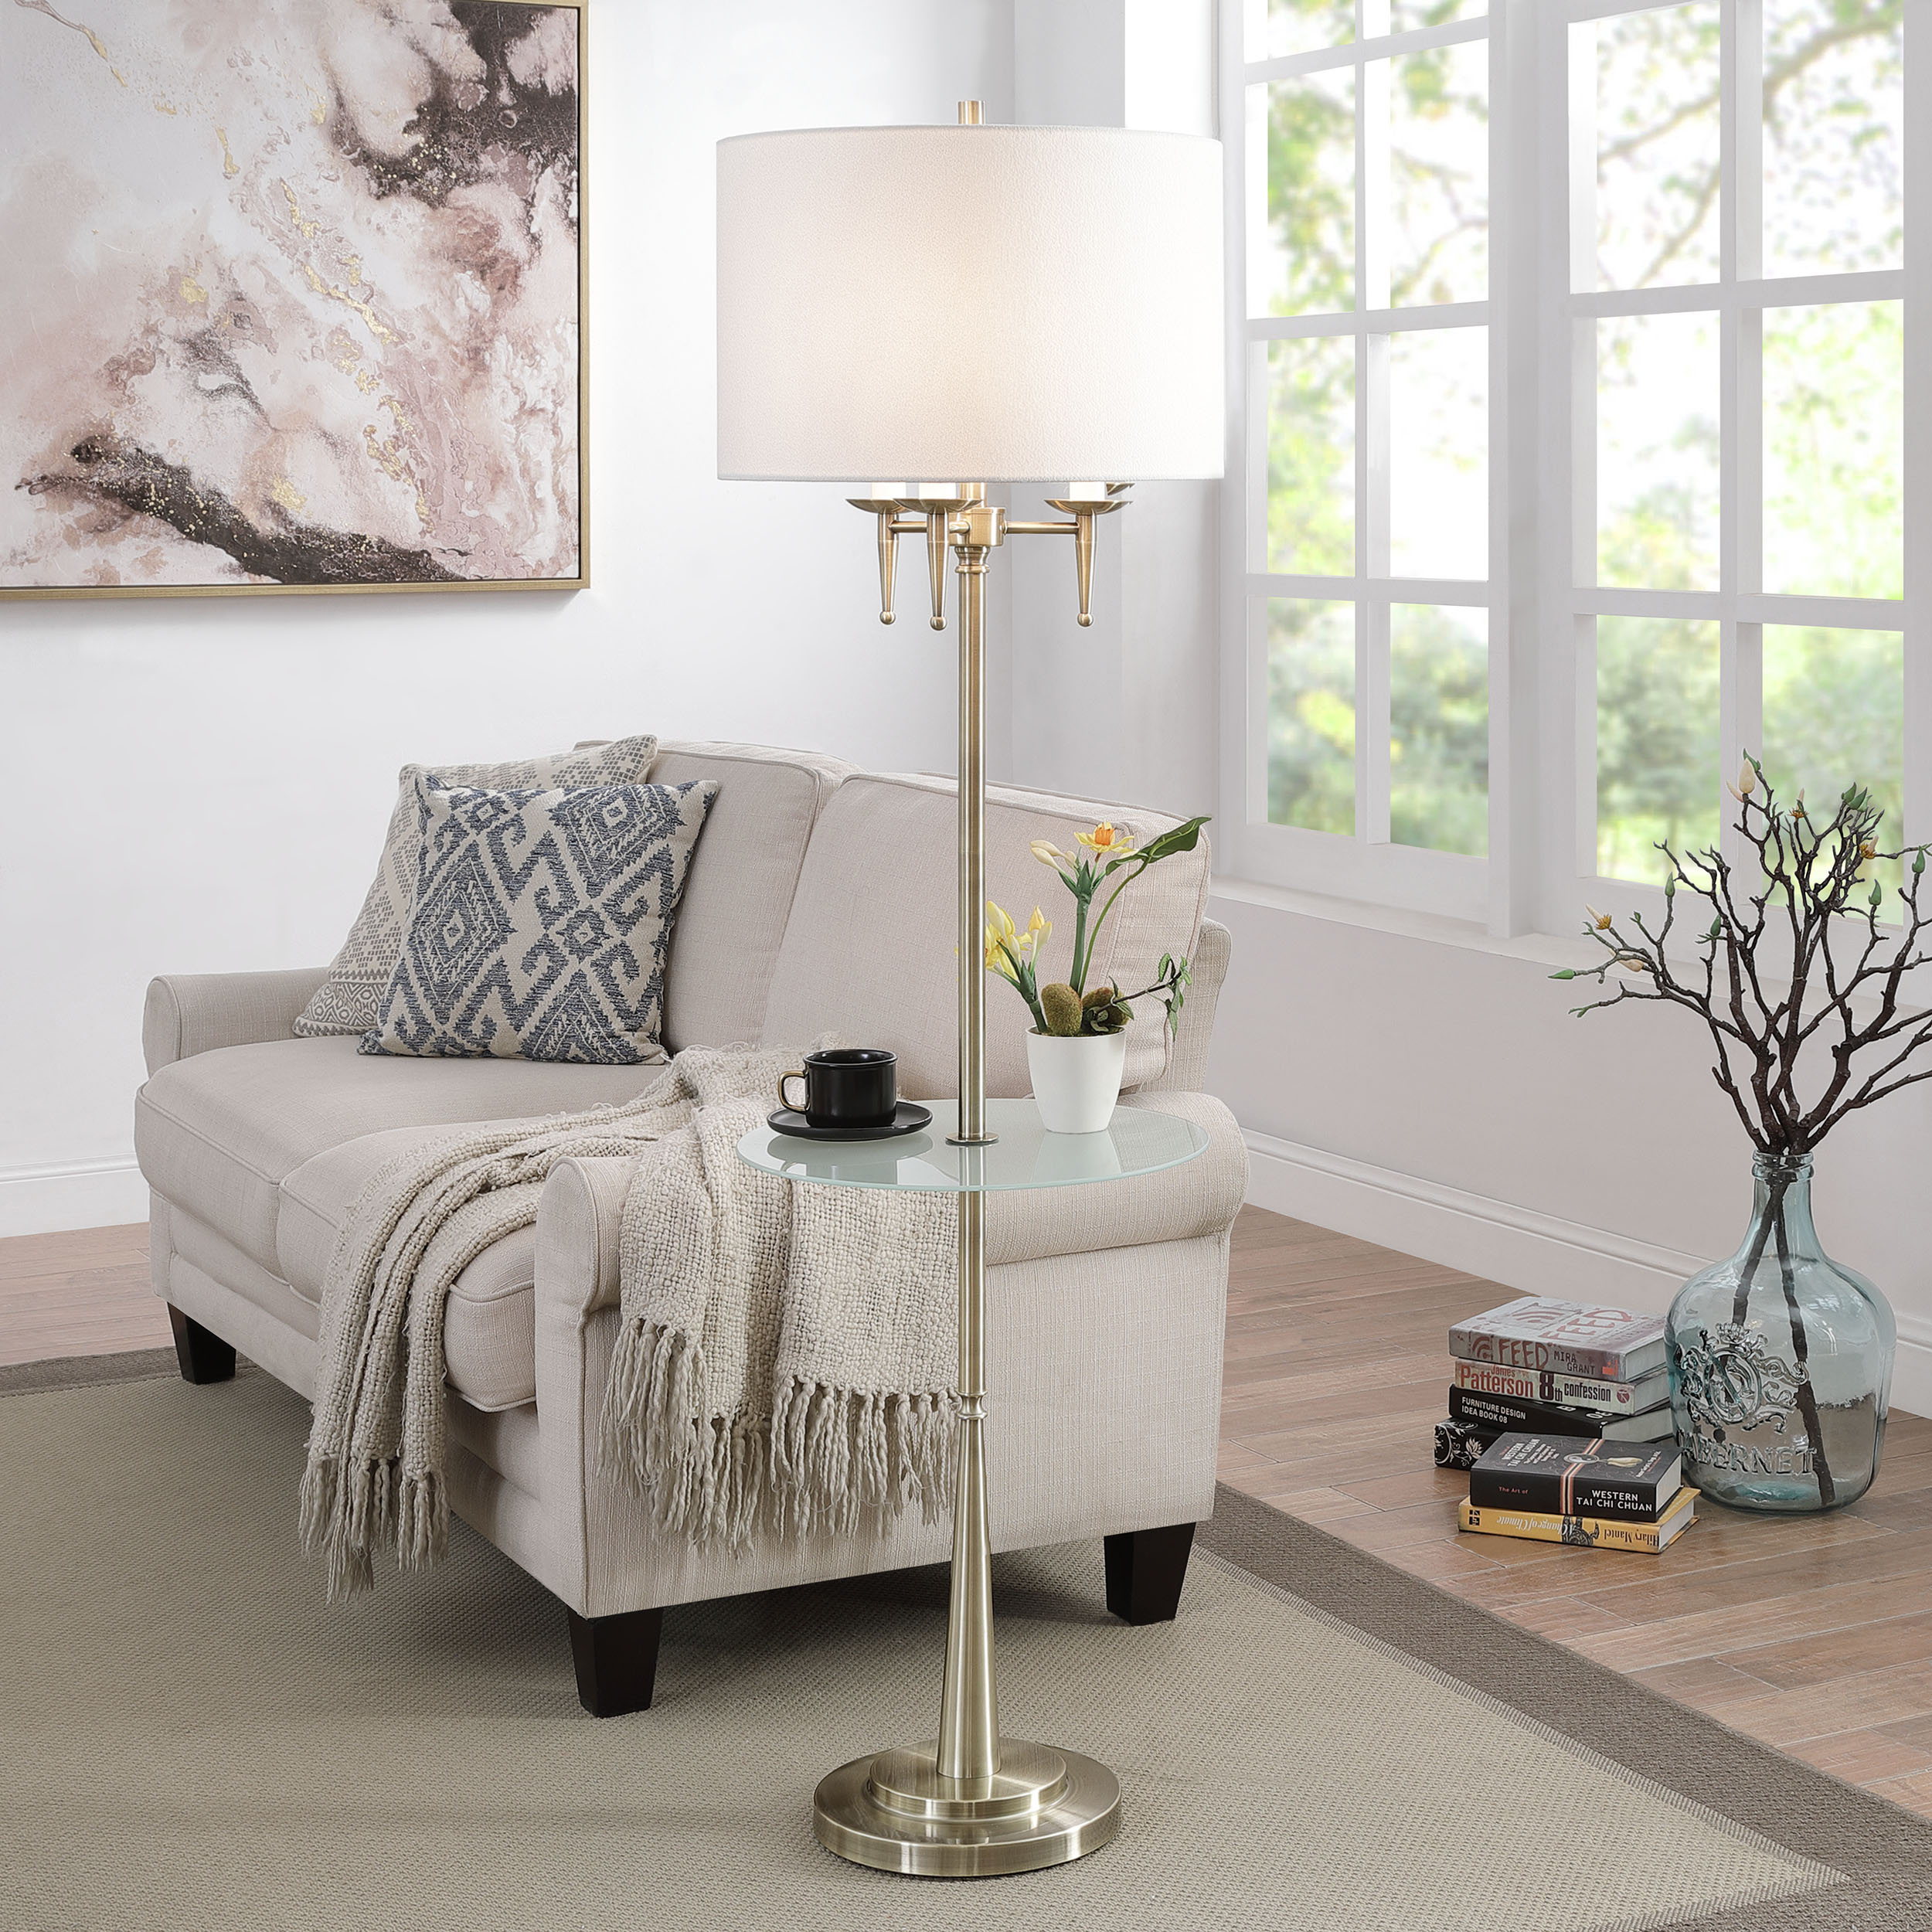 Traditional Brass Candlestick Floor Lamp